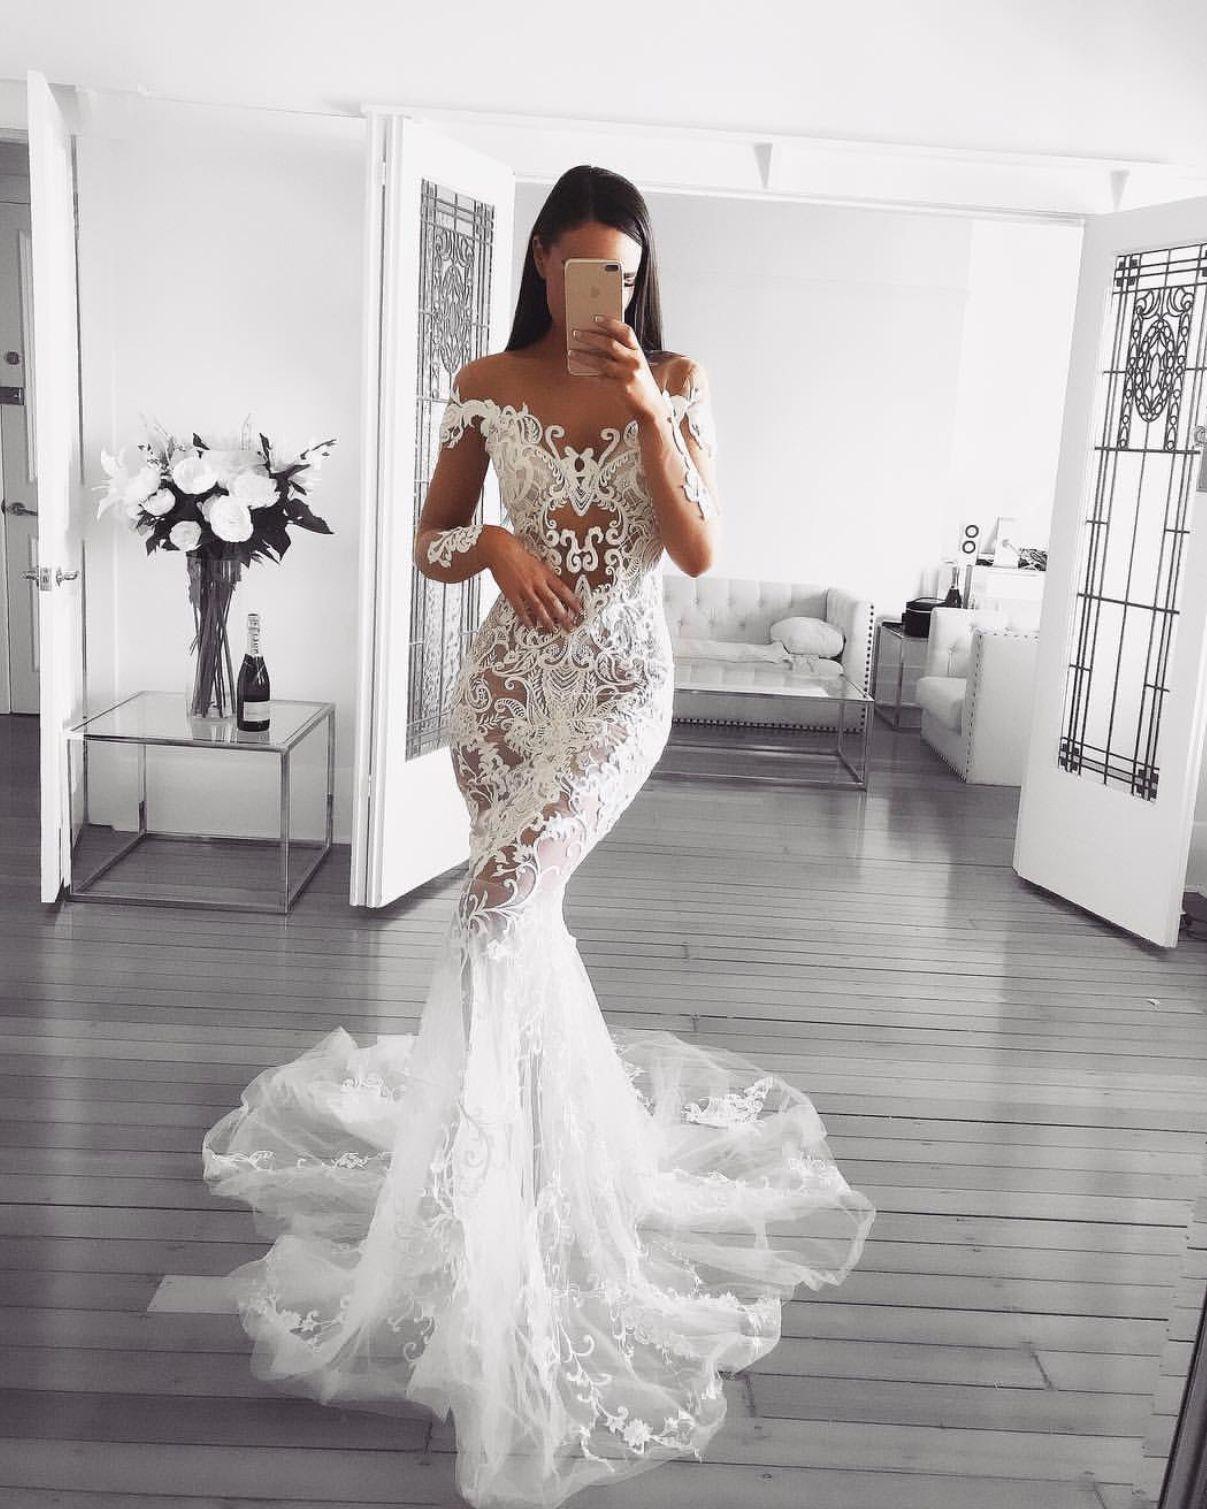 Pinterest bellaedwards_1 Dream wedding dresses, Wedding